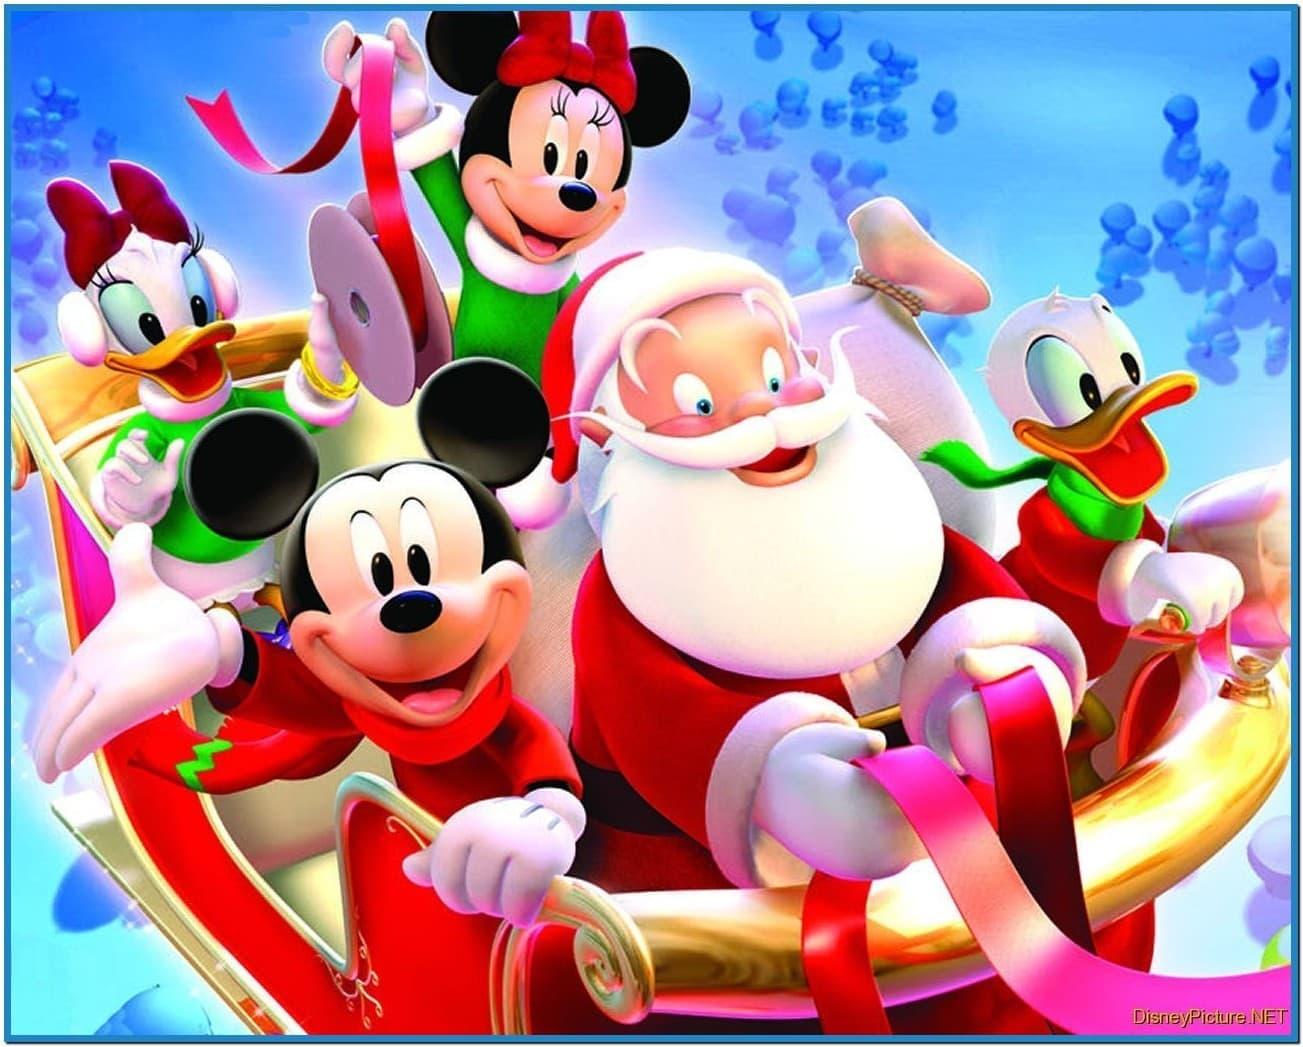 Disney christmas wallpaper and screensavers Download 1303x1047